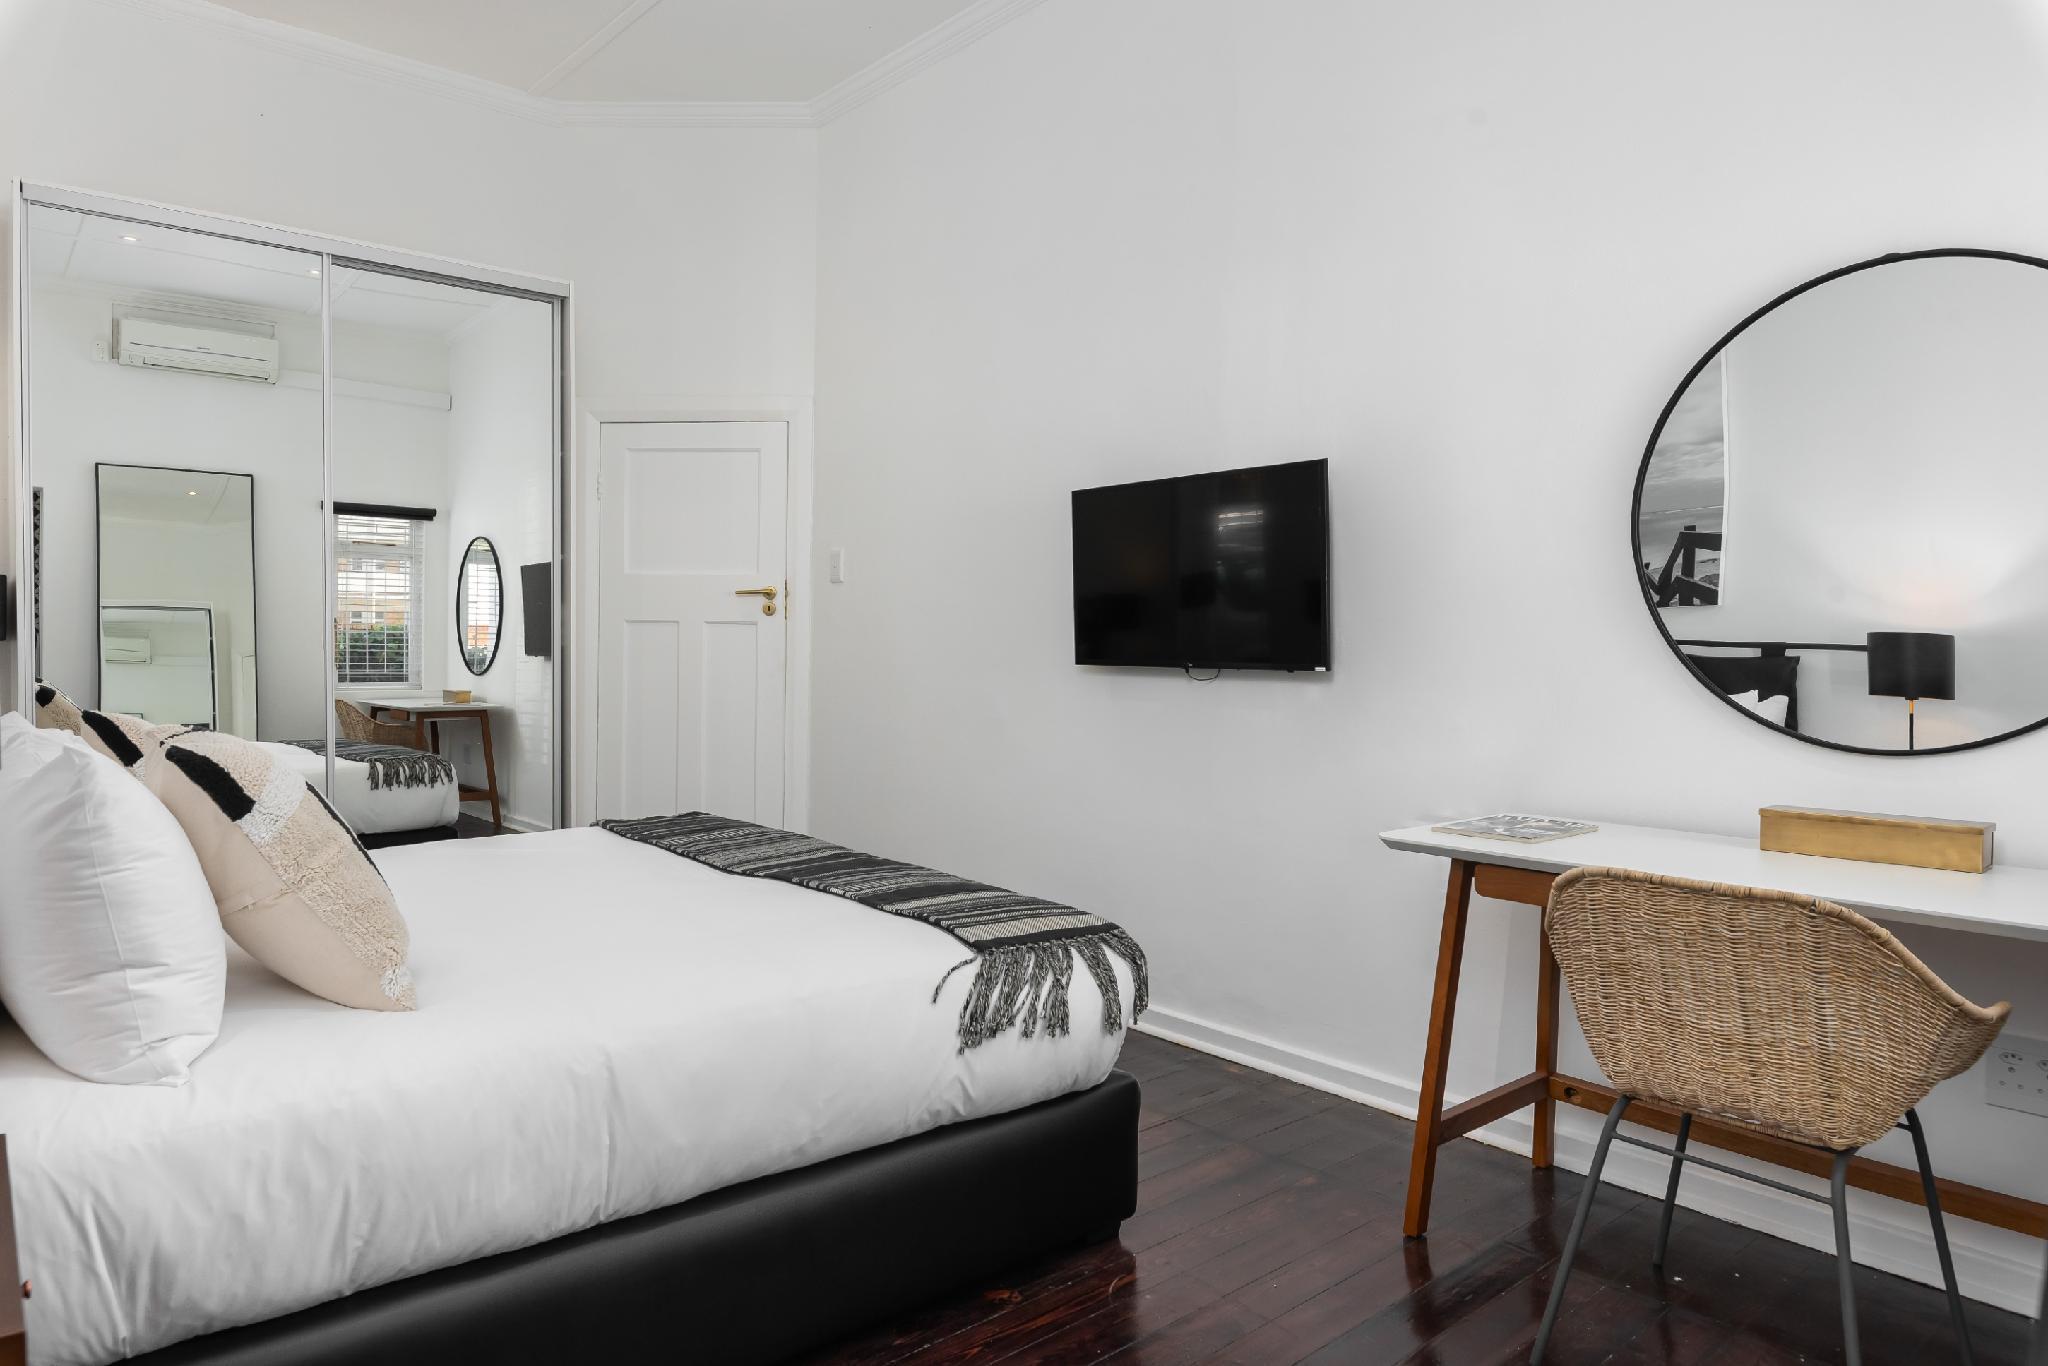 Casa Outlaws Upper Apartment  Luxury 3 BR W  Views